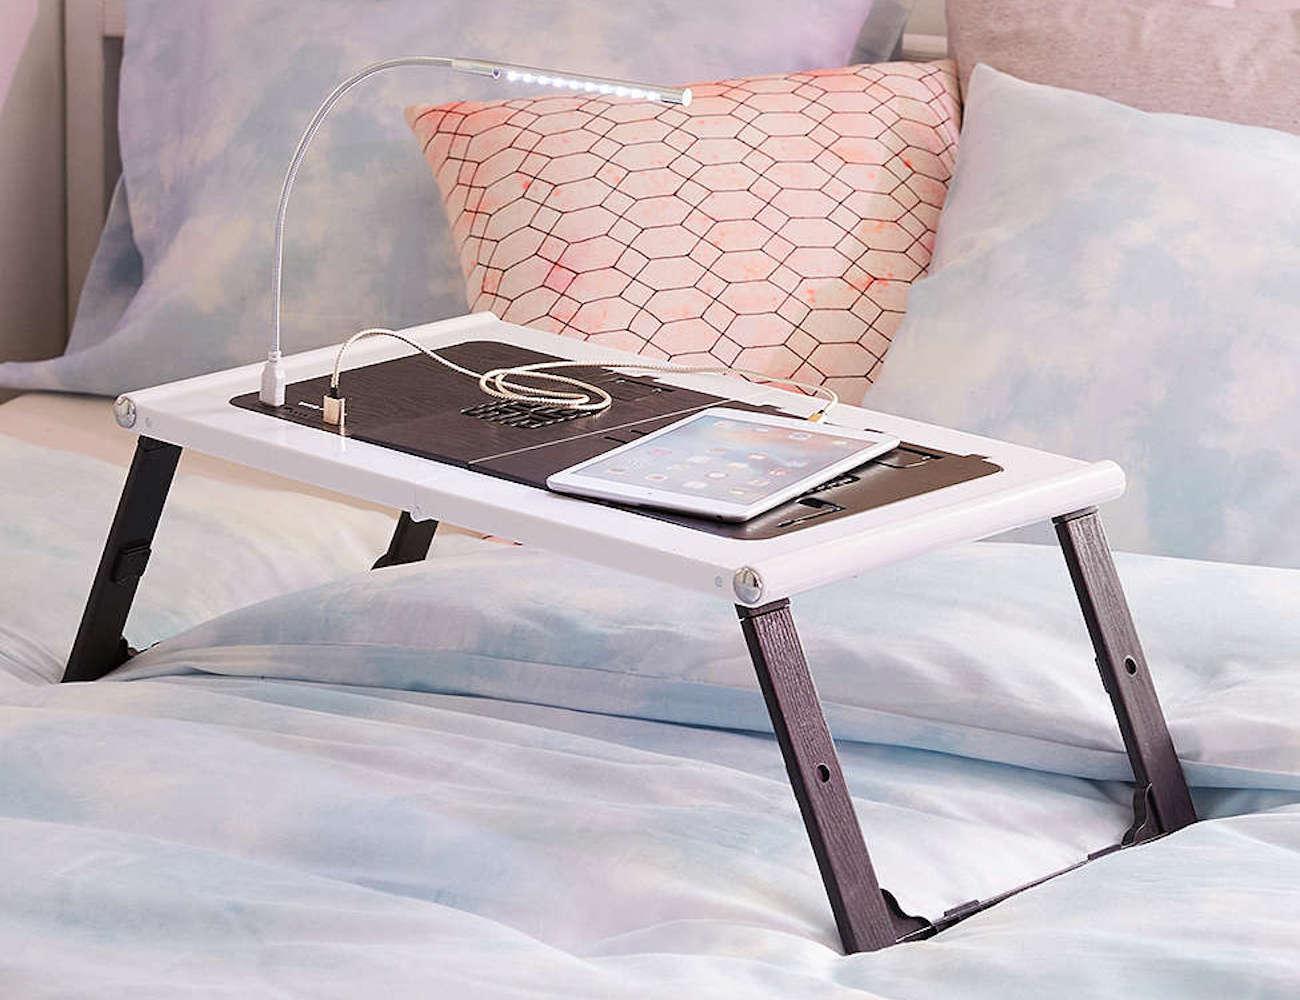 ICharge+Portable+Charging+Desk